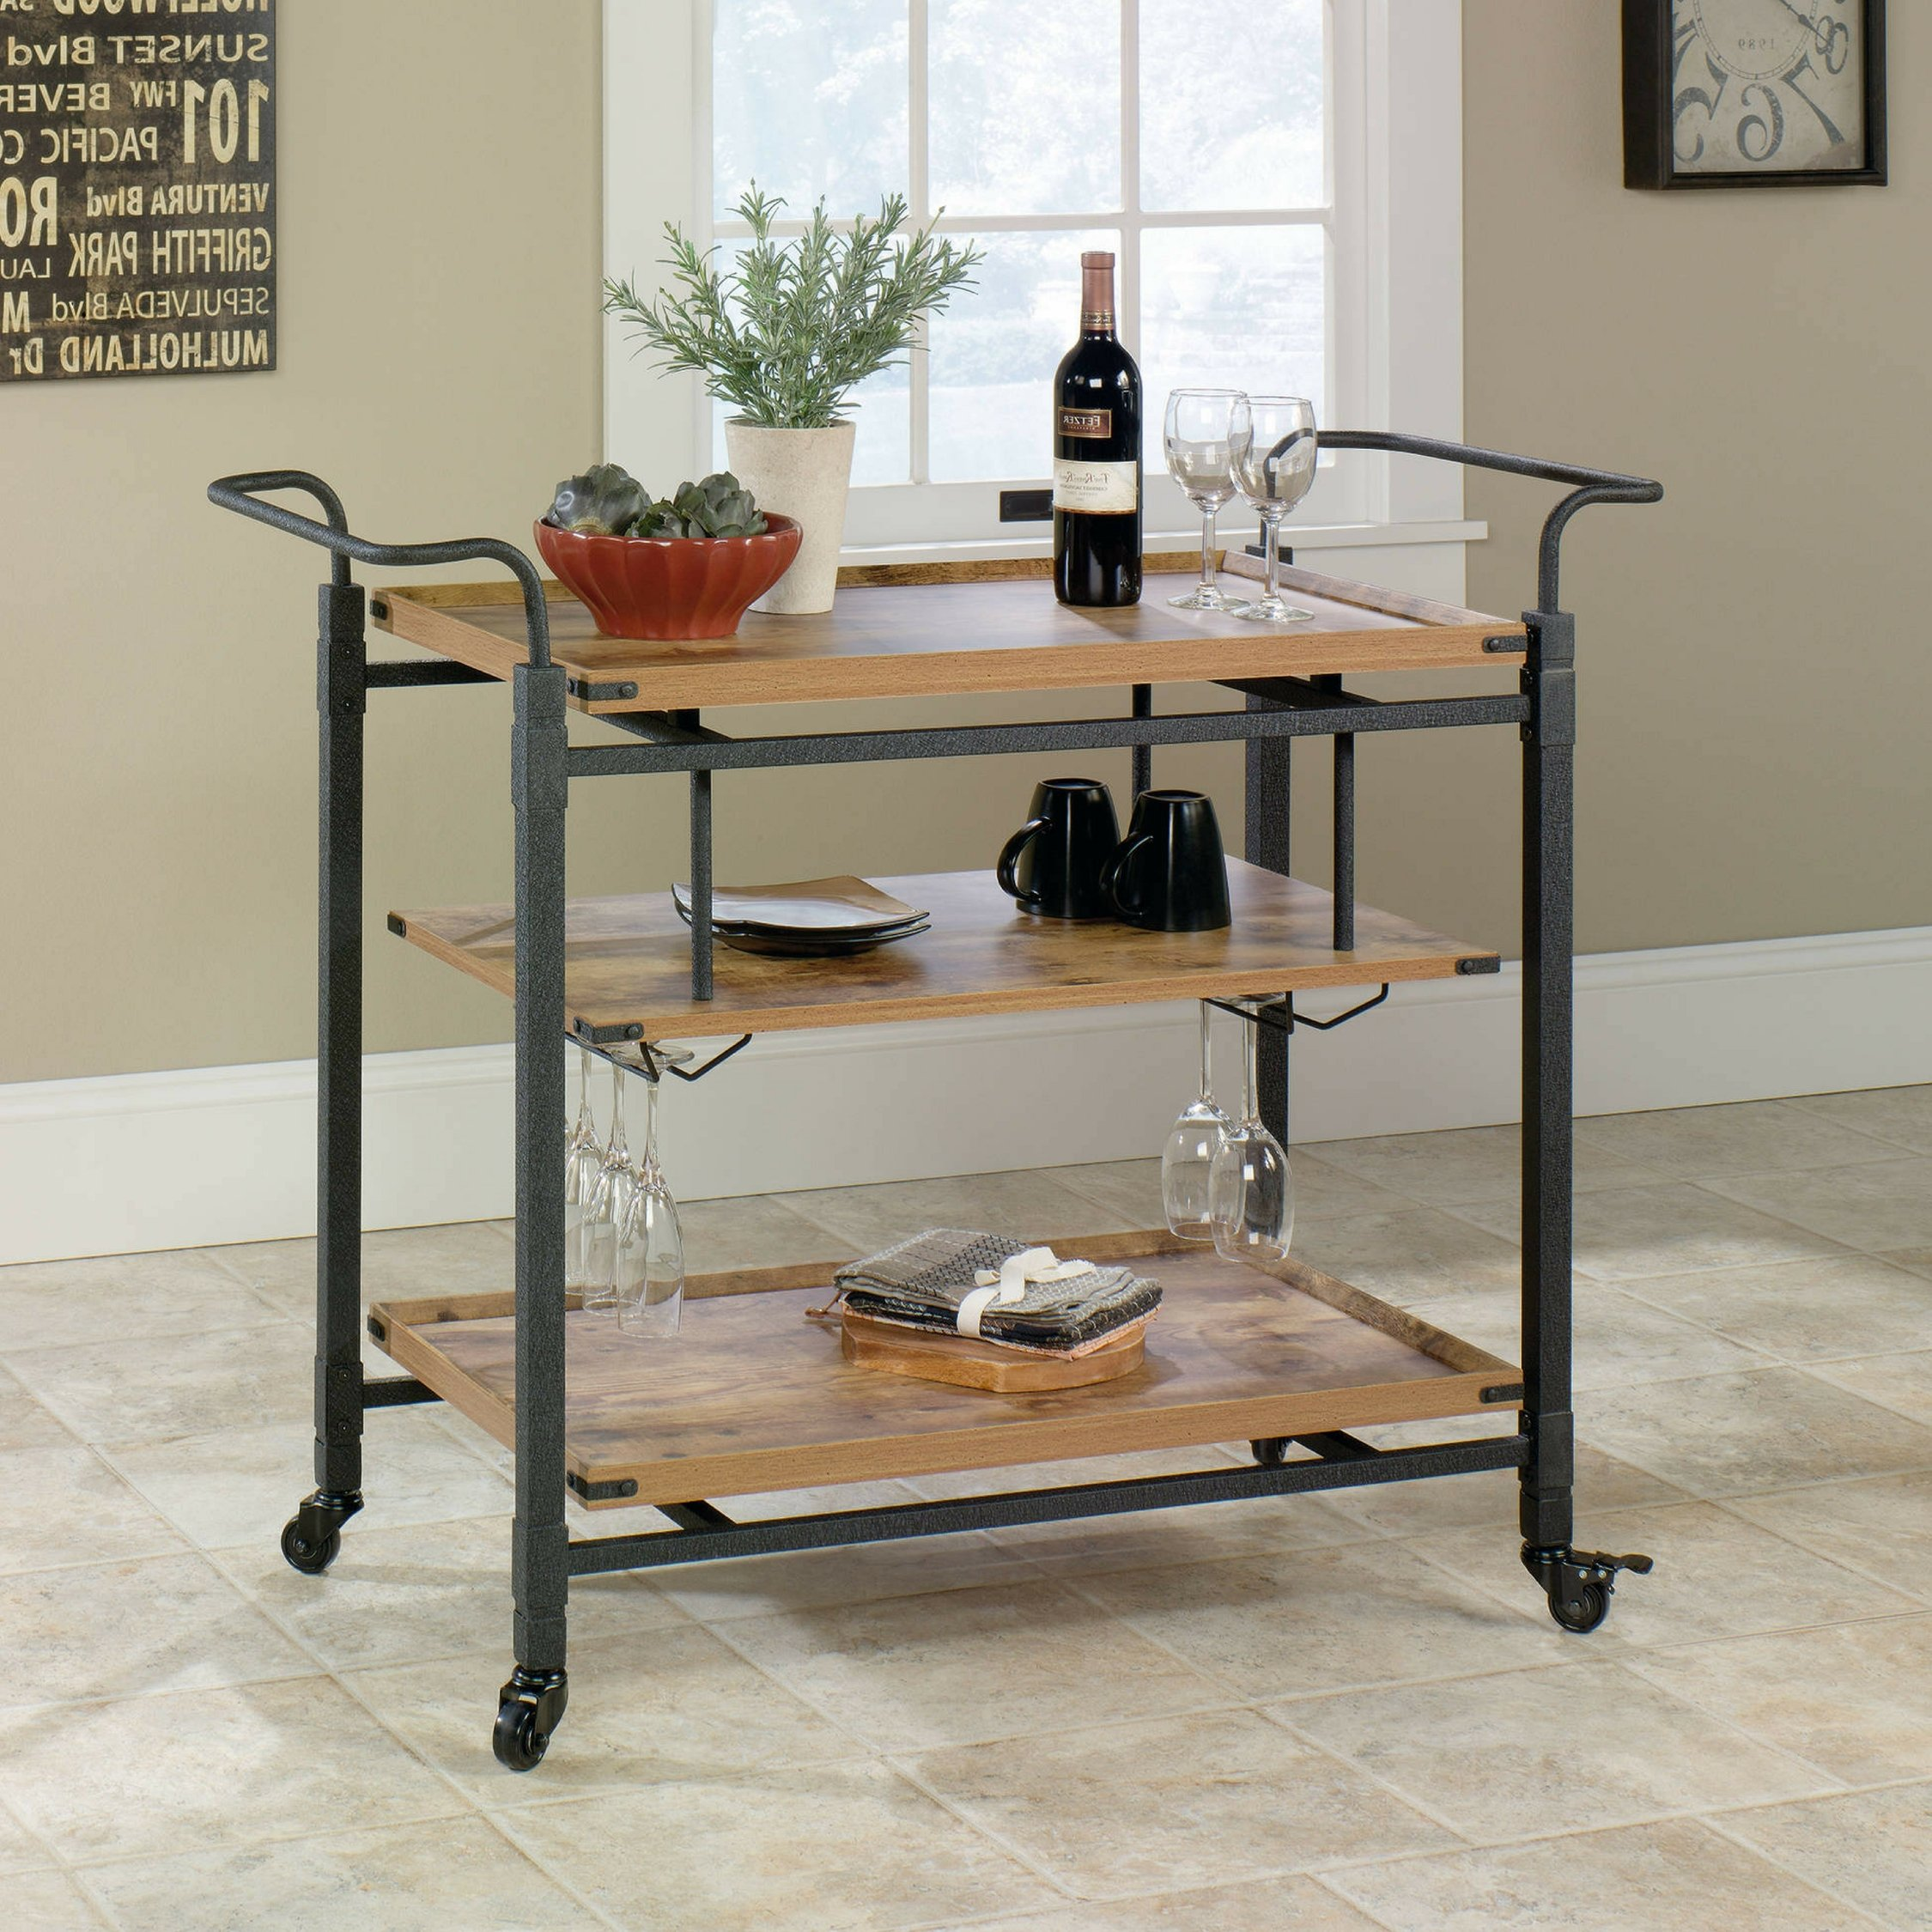 Antiqued Black Rustic Country Bar 3 shelves Cart, Pine Finish